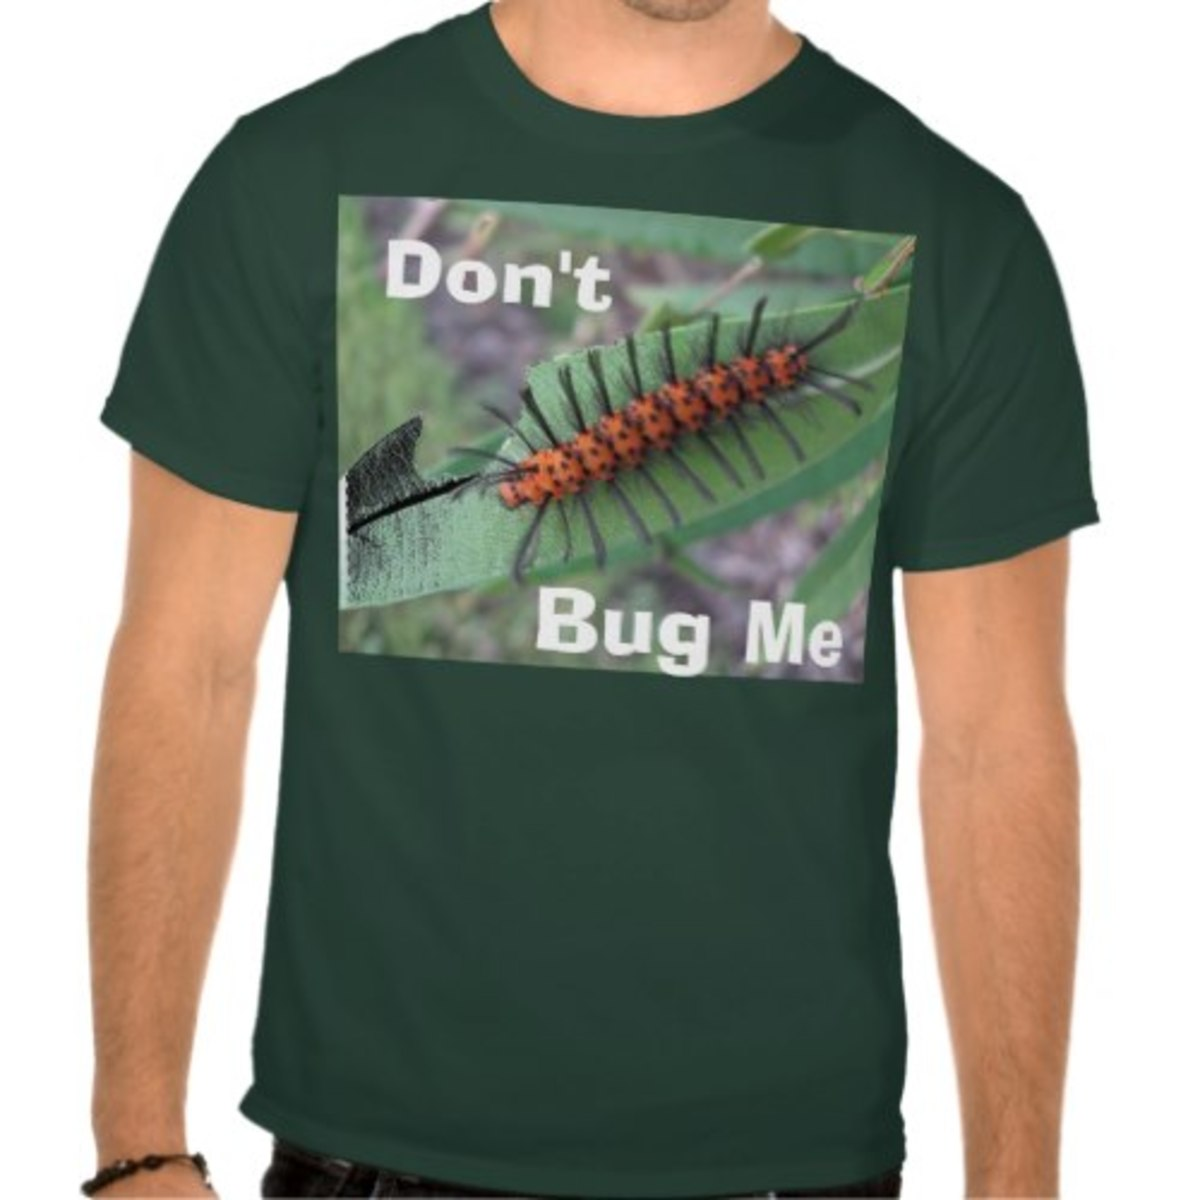 My caterpillar photo on a shirt on Zazzle.